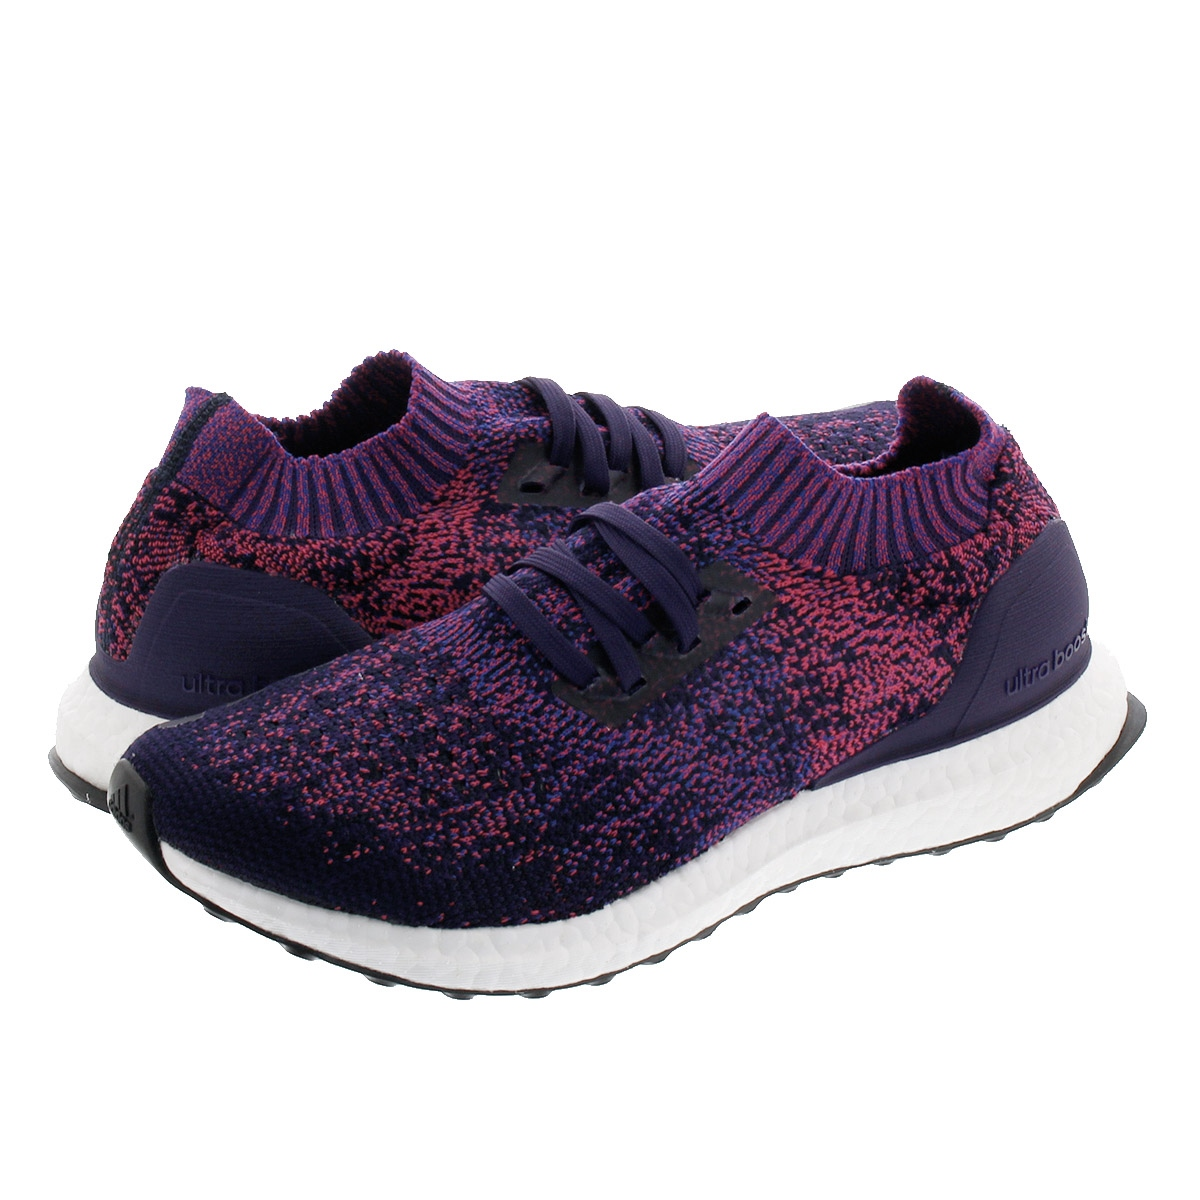 adidas boost violet